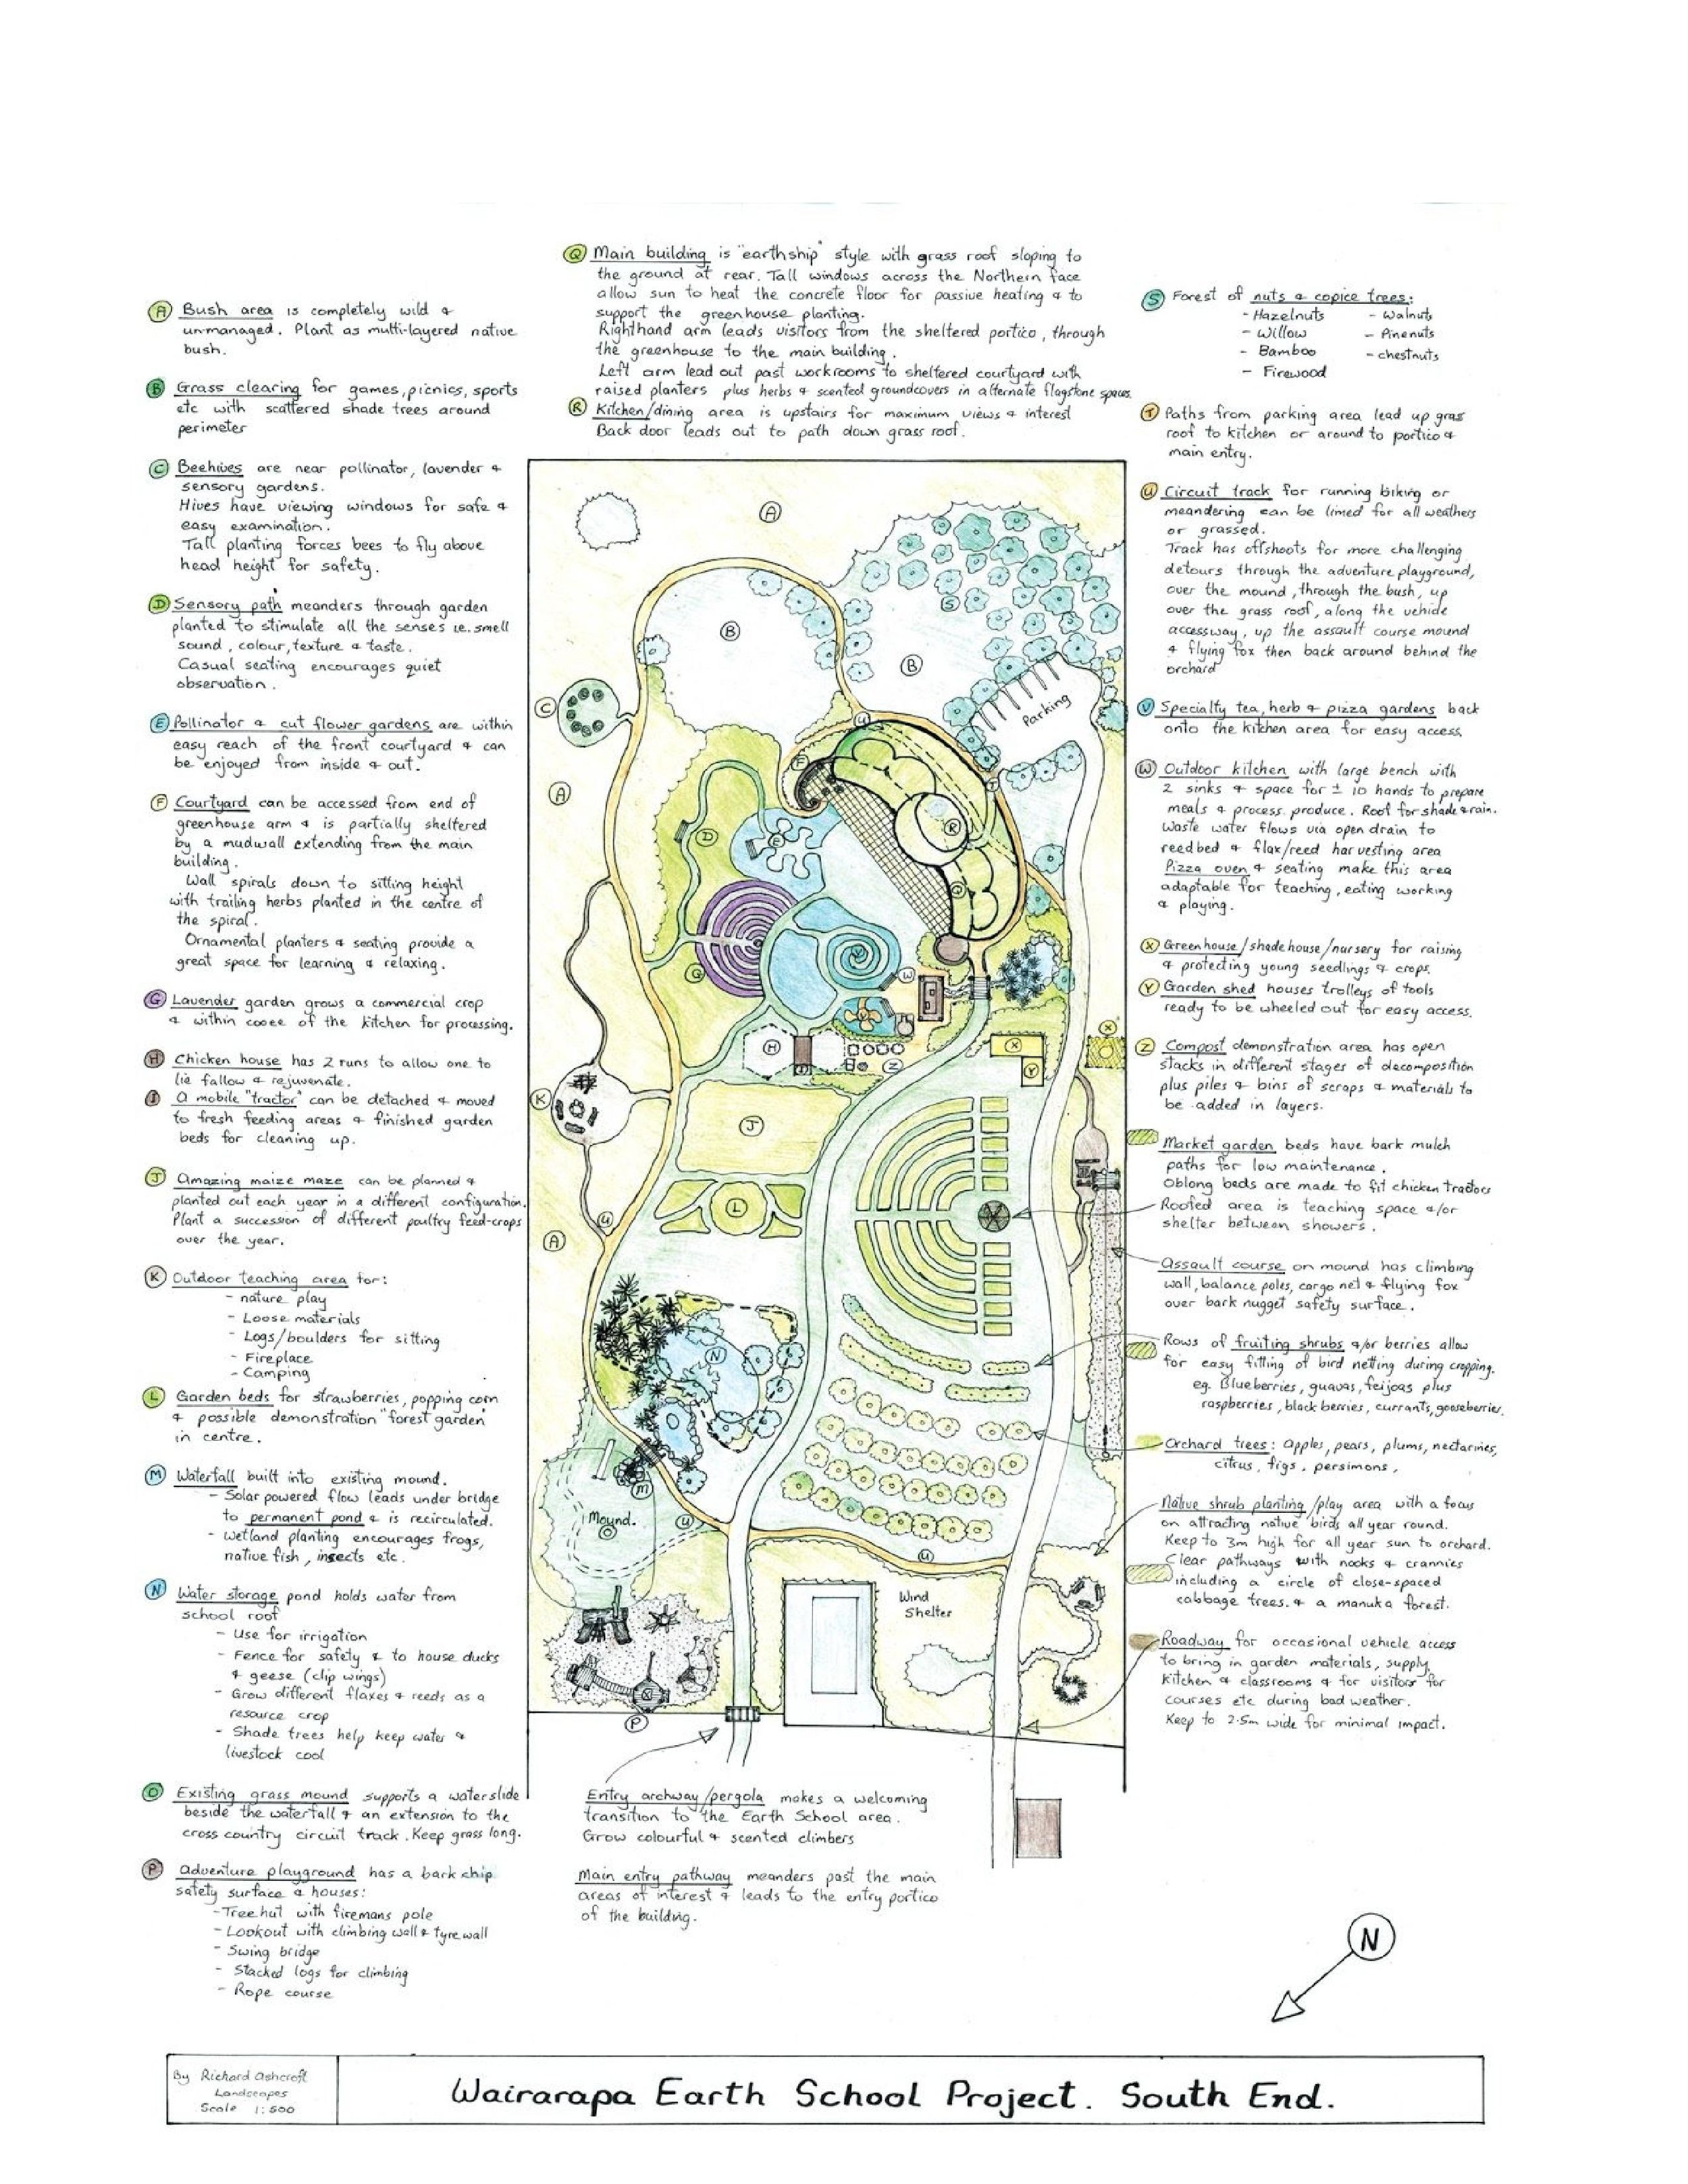 Farm+Design-+Wairarapa+Earth+School+Te+Kura+o+Papatuanuku-page-001.jpg